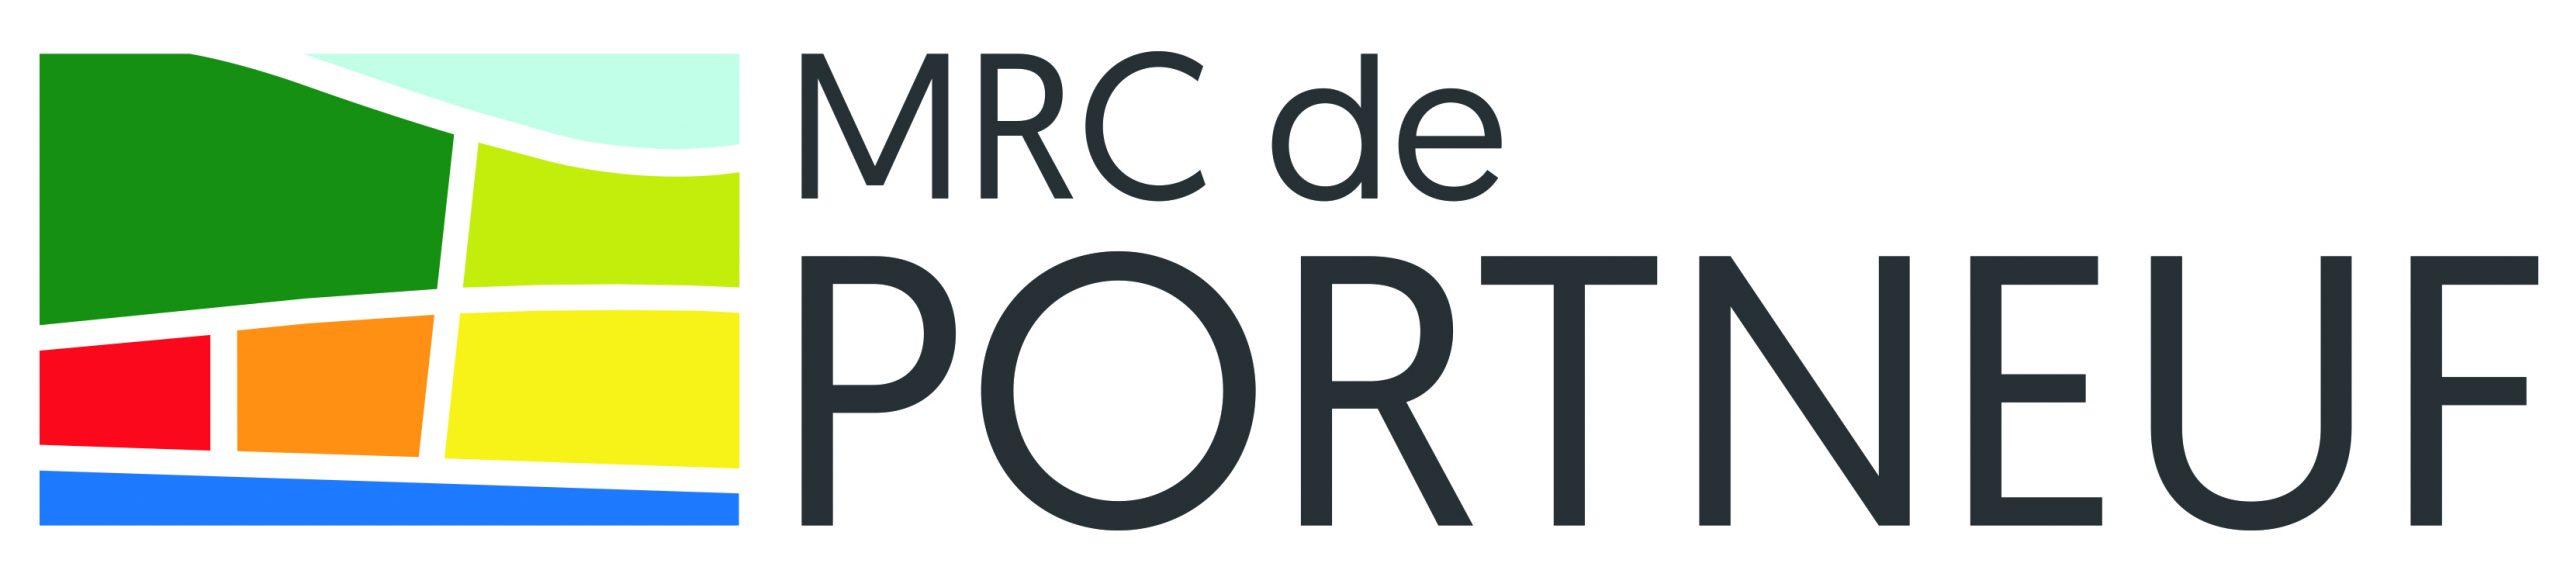 MRC de Portneuf